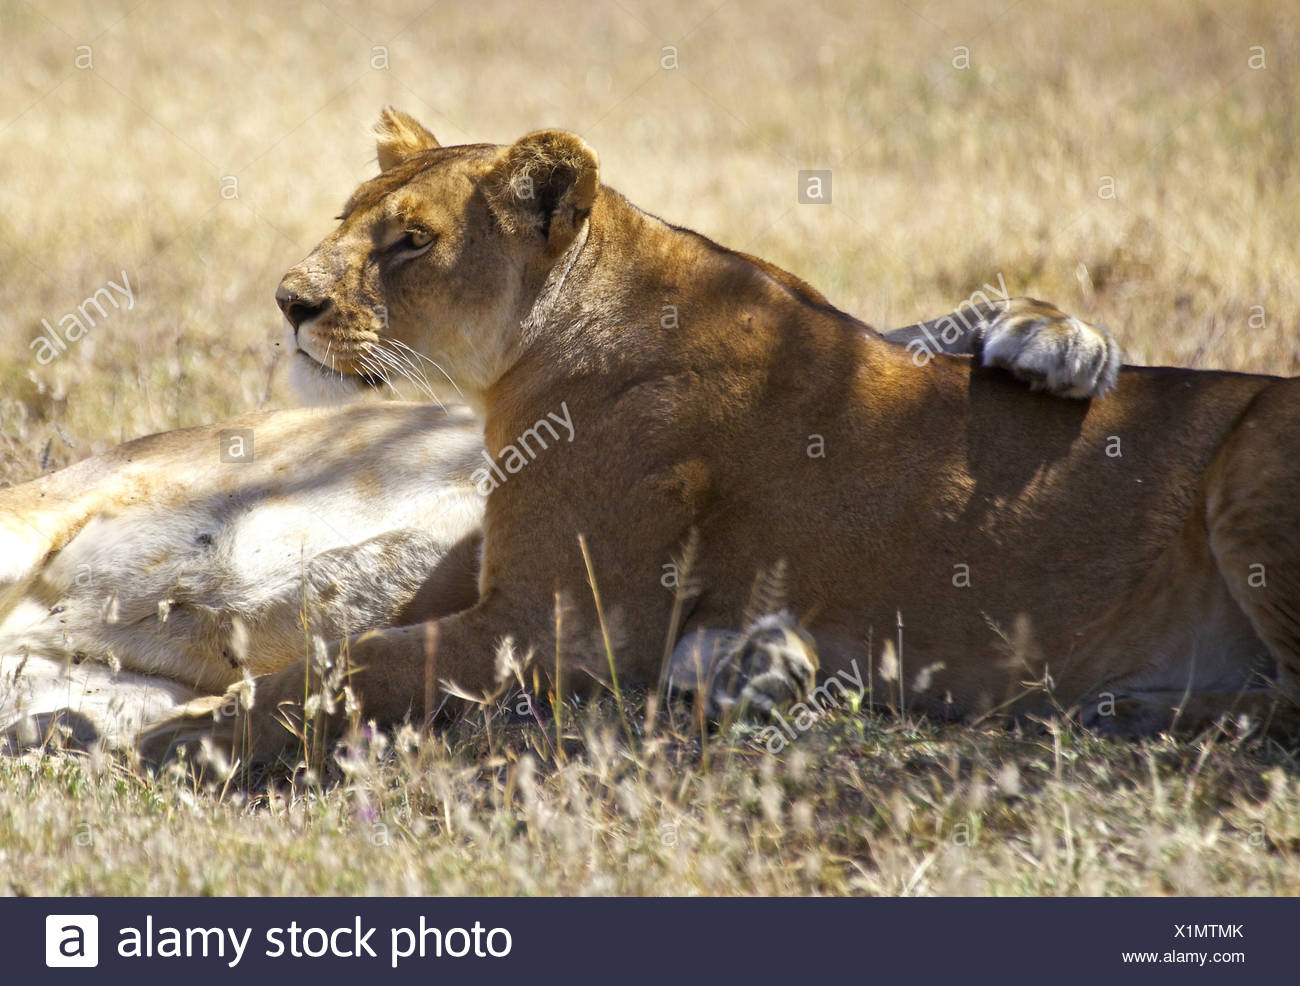 Companionship Panthera Leo Stock Photos Companionship Panthera 1300x986